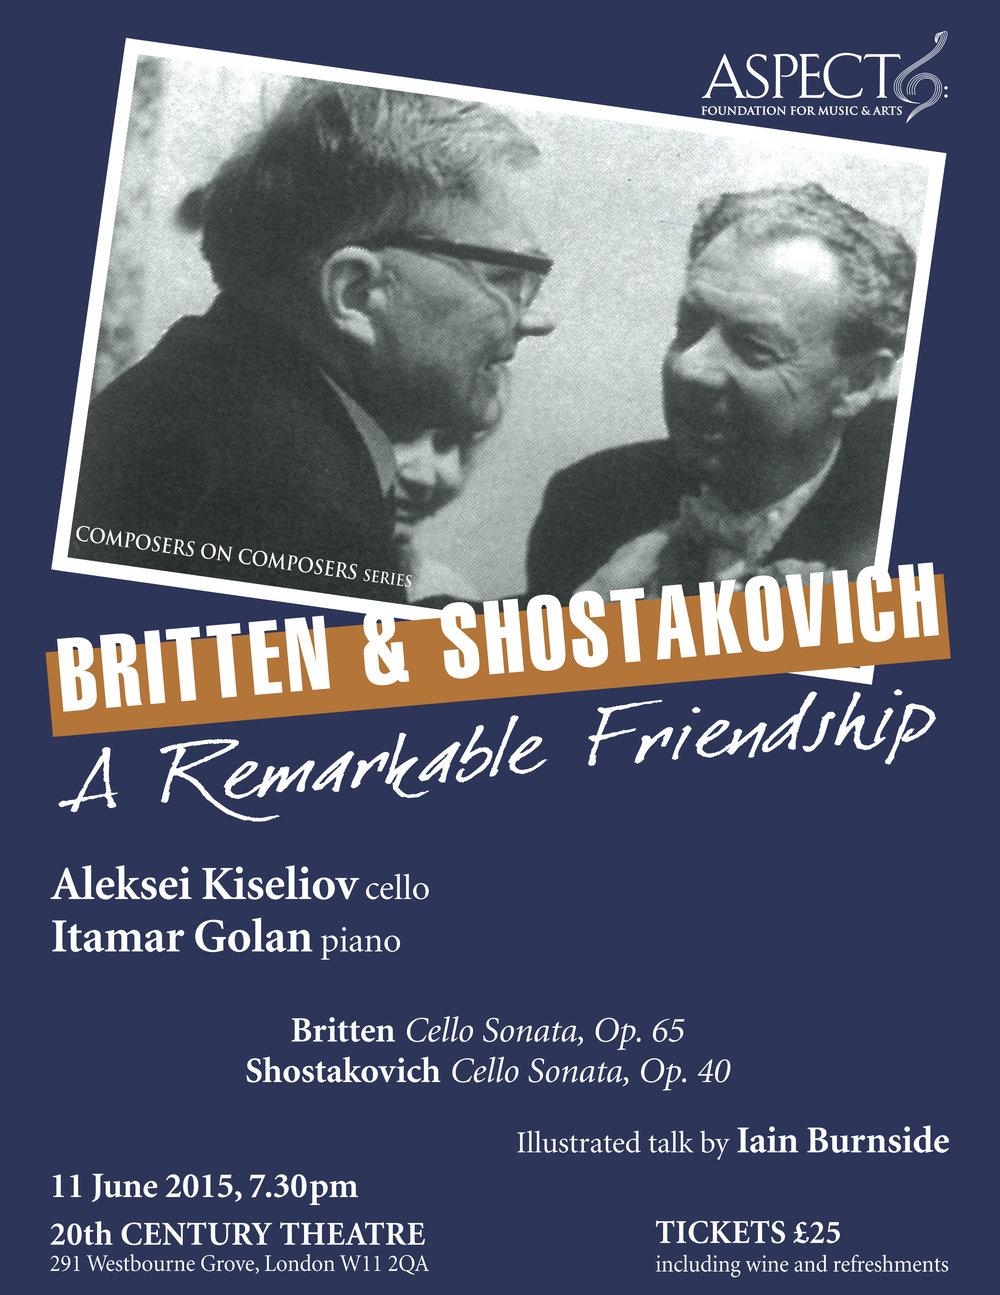 ASP15 BrittenShostakovich A5 HR image no booking.jpg